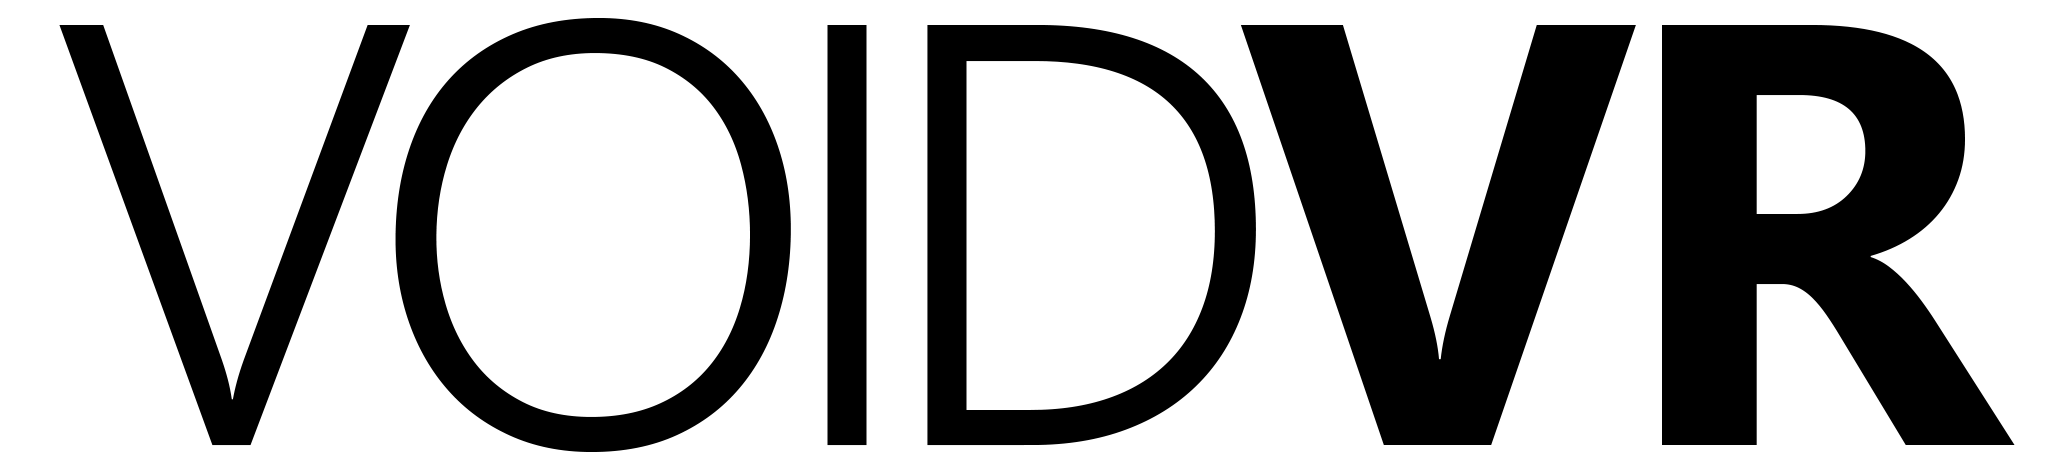 VoidVr Logo